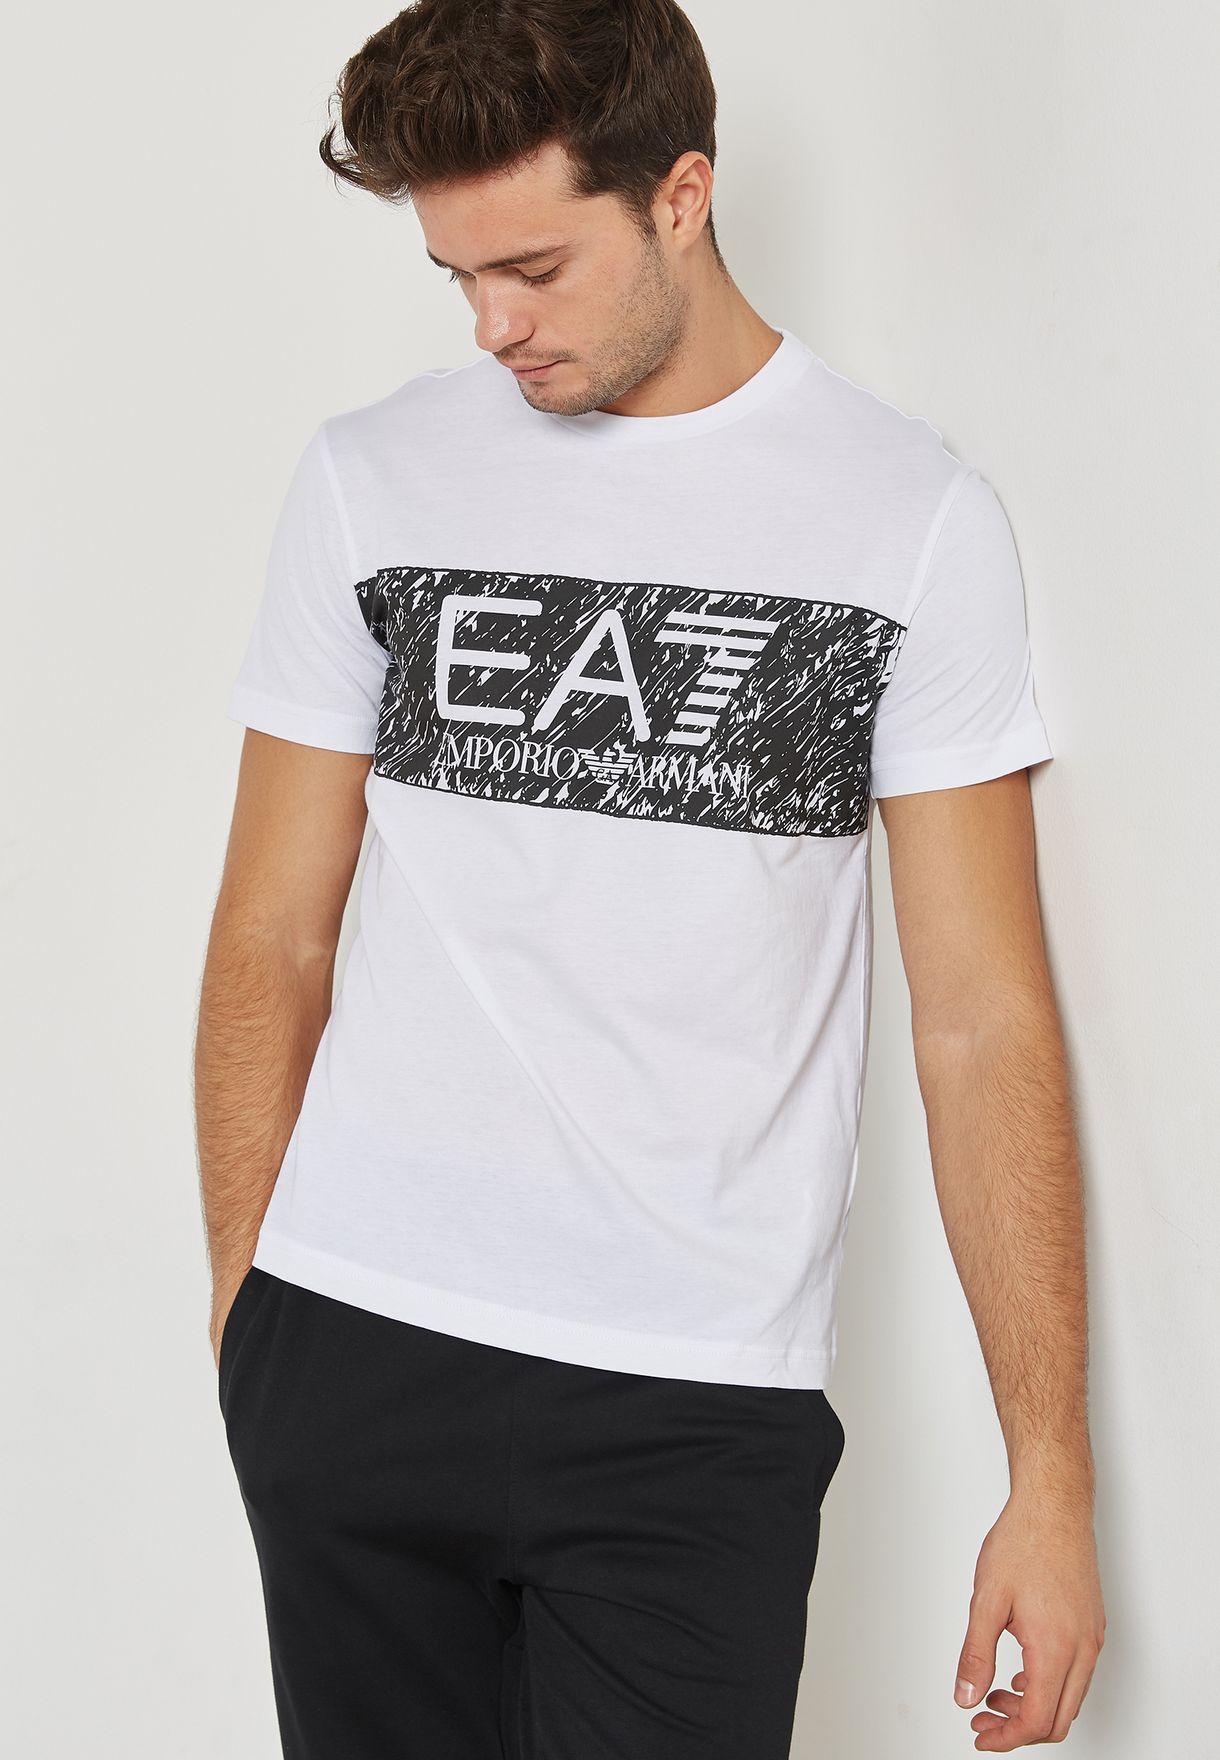 9e9f936e63 Shop Ea7 Emporio Armani white Train Logo T-Shirt PJ02Z-6YPT82-1100 ...